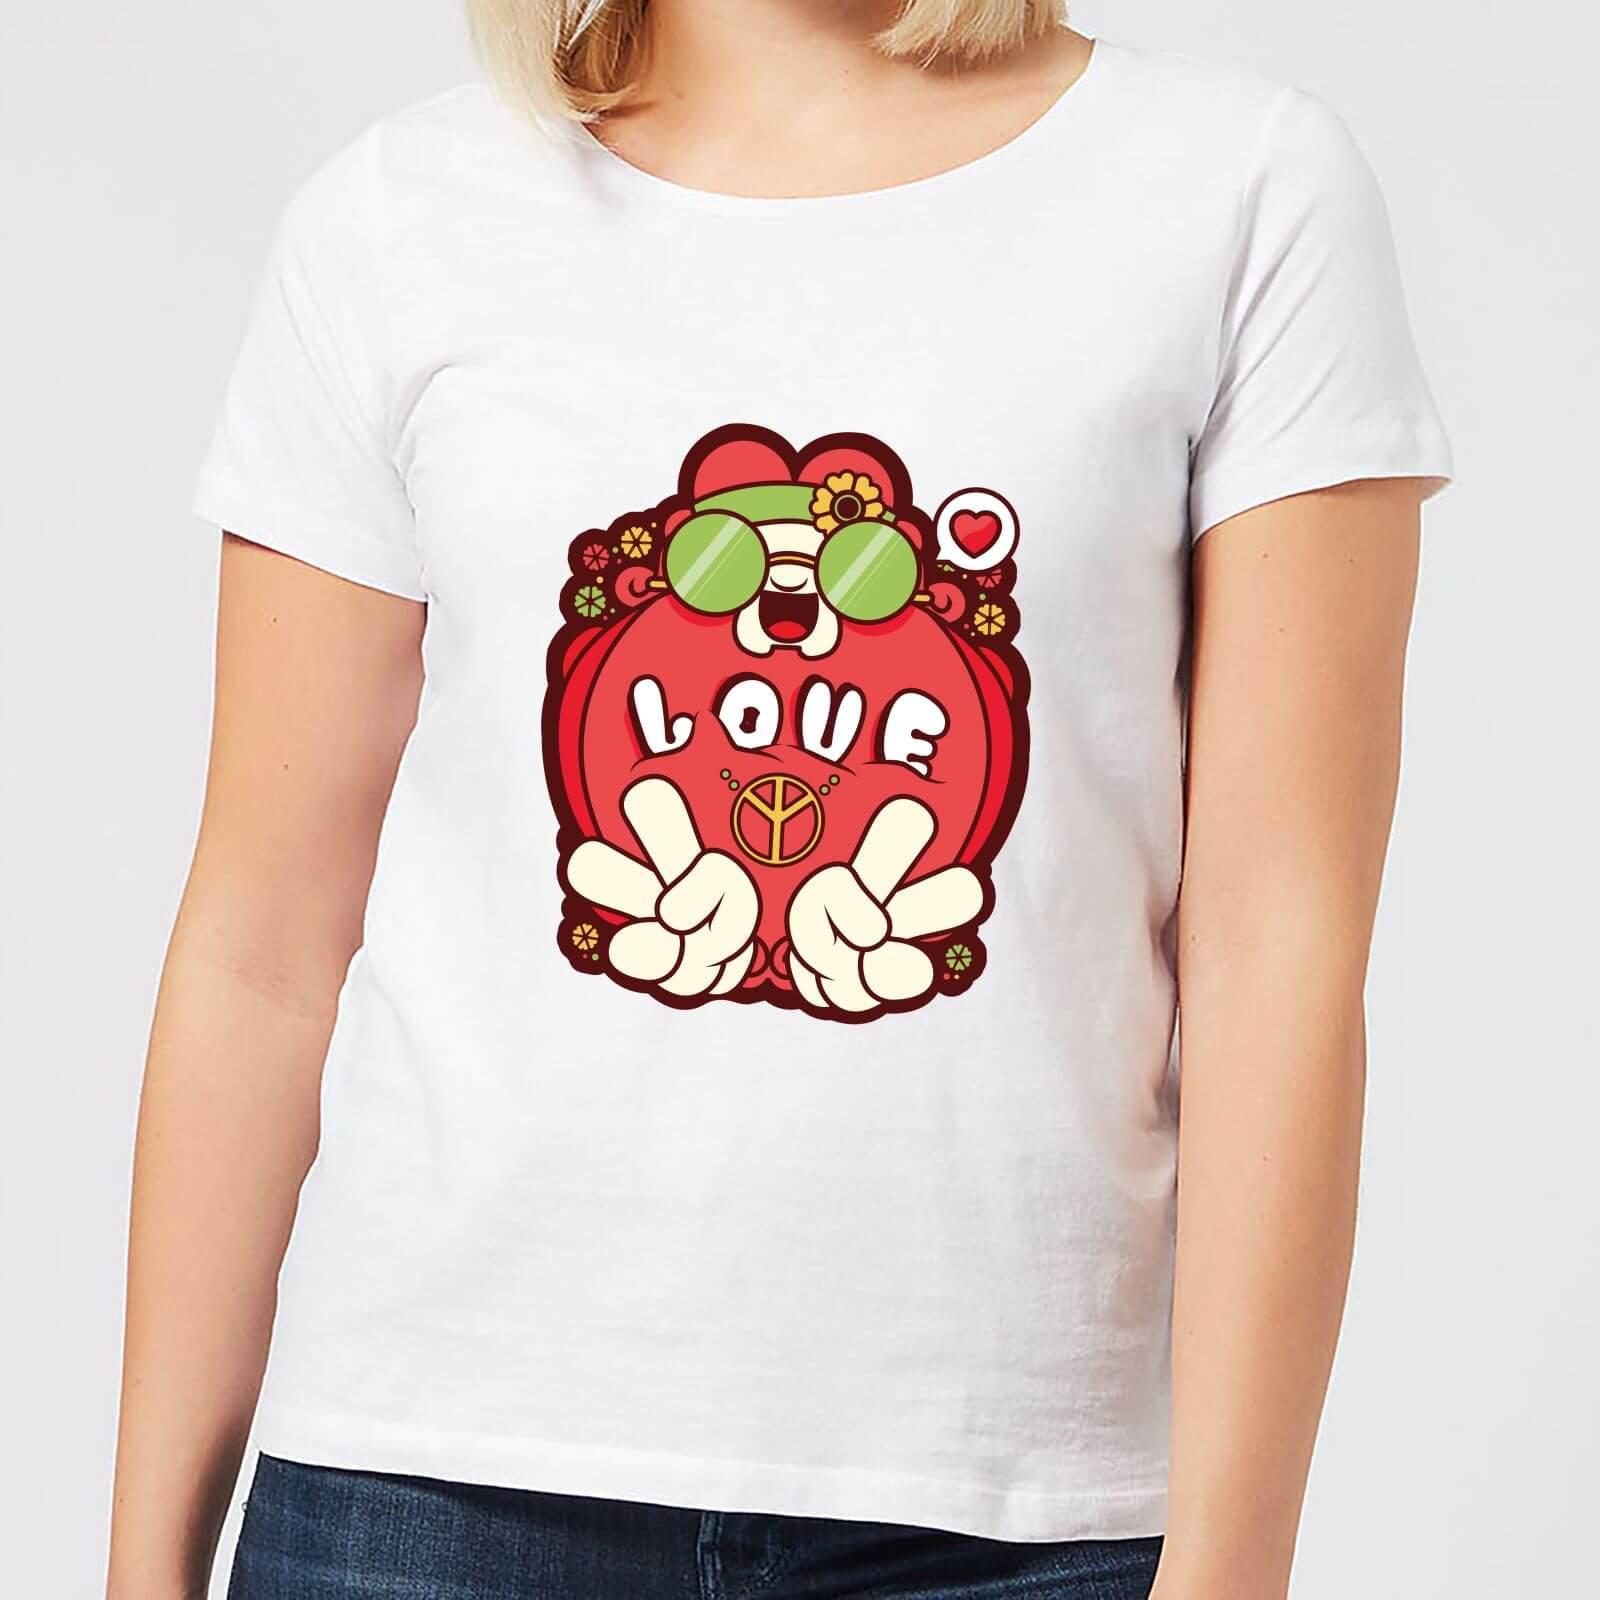 IWOOT Hippie Love Cartoon Women's T-Shirt - White - 4XL - White